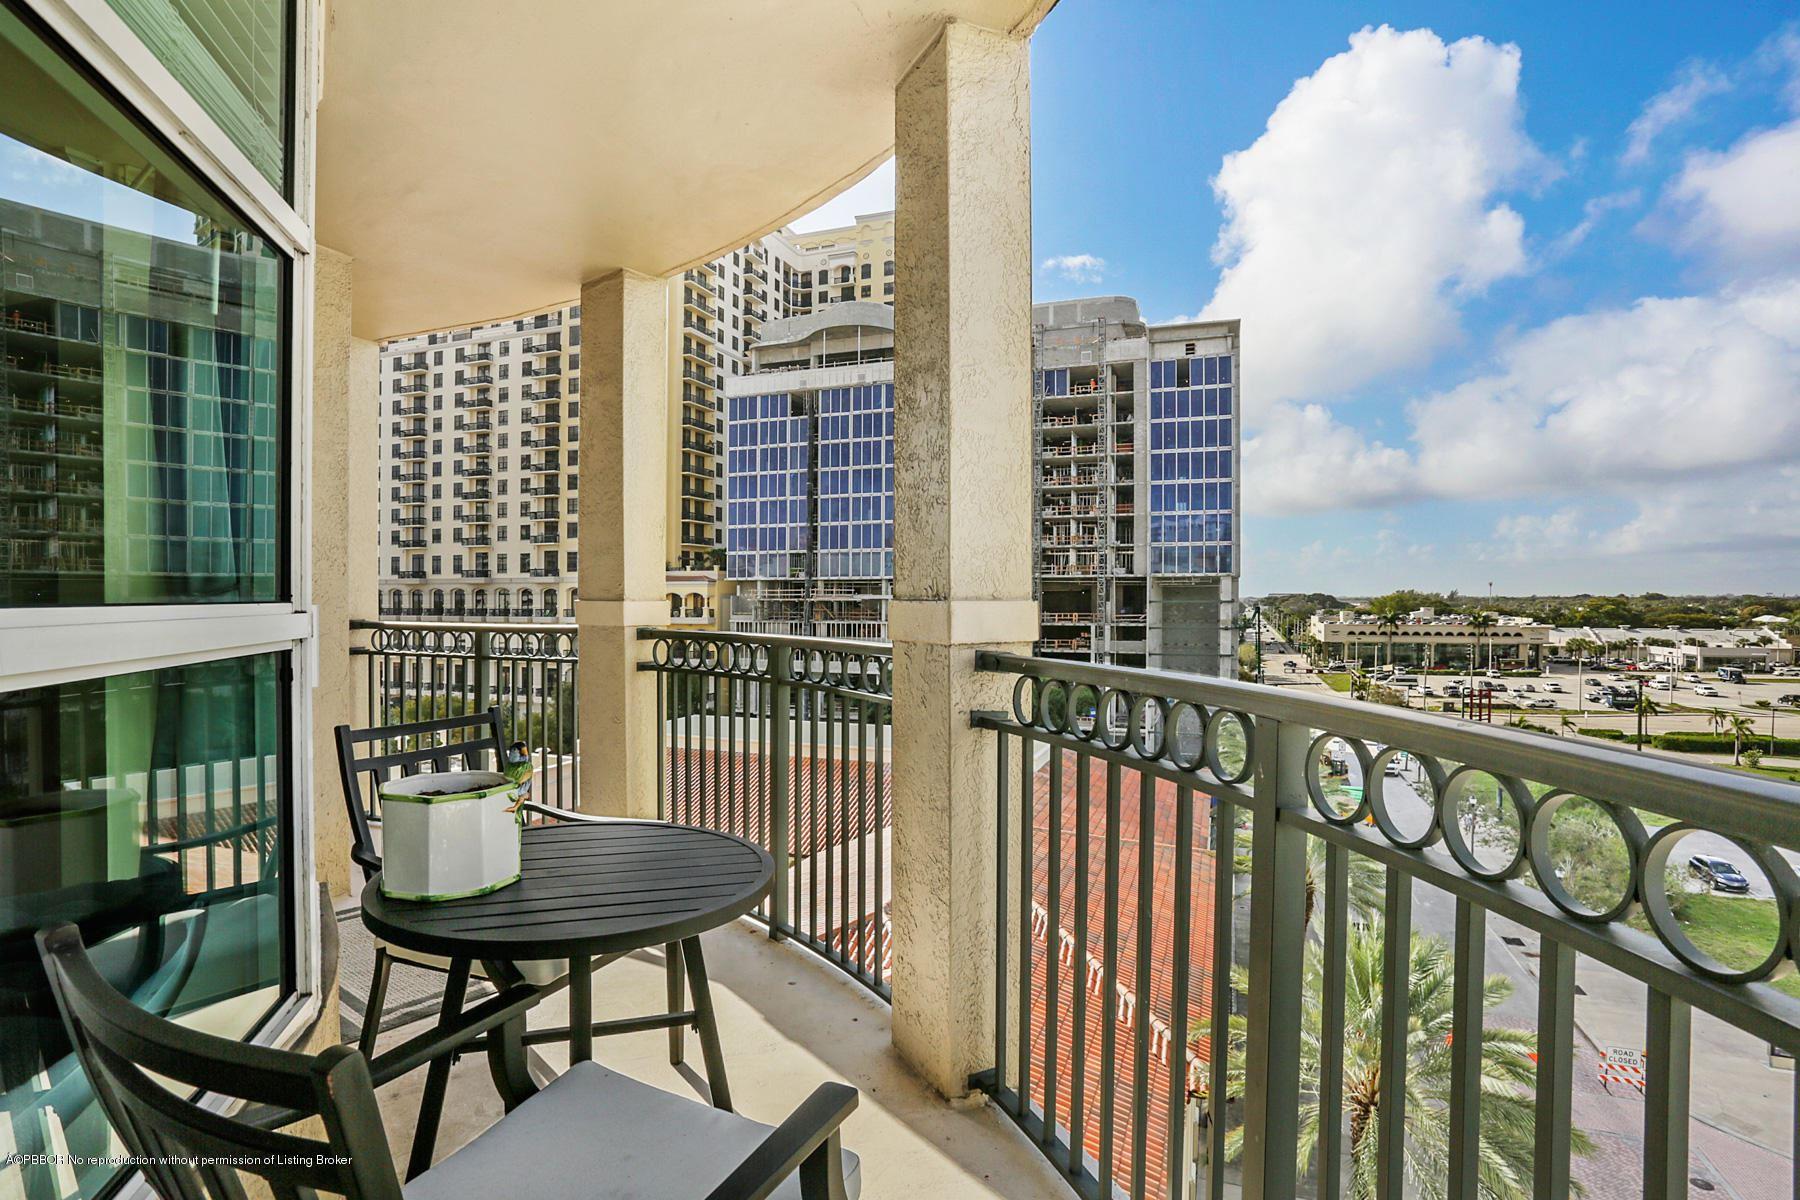 600 S Dixie Hwy West Palm Beach, FL 33401